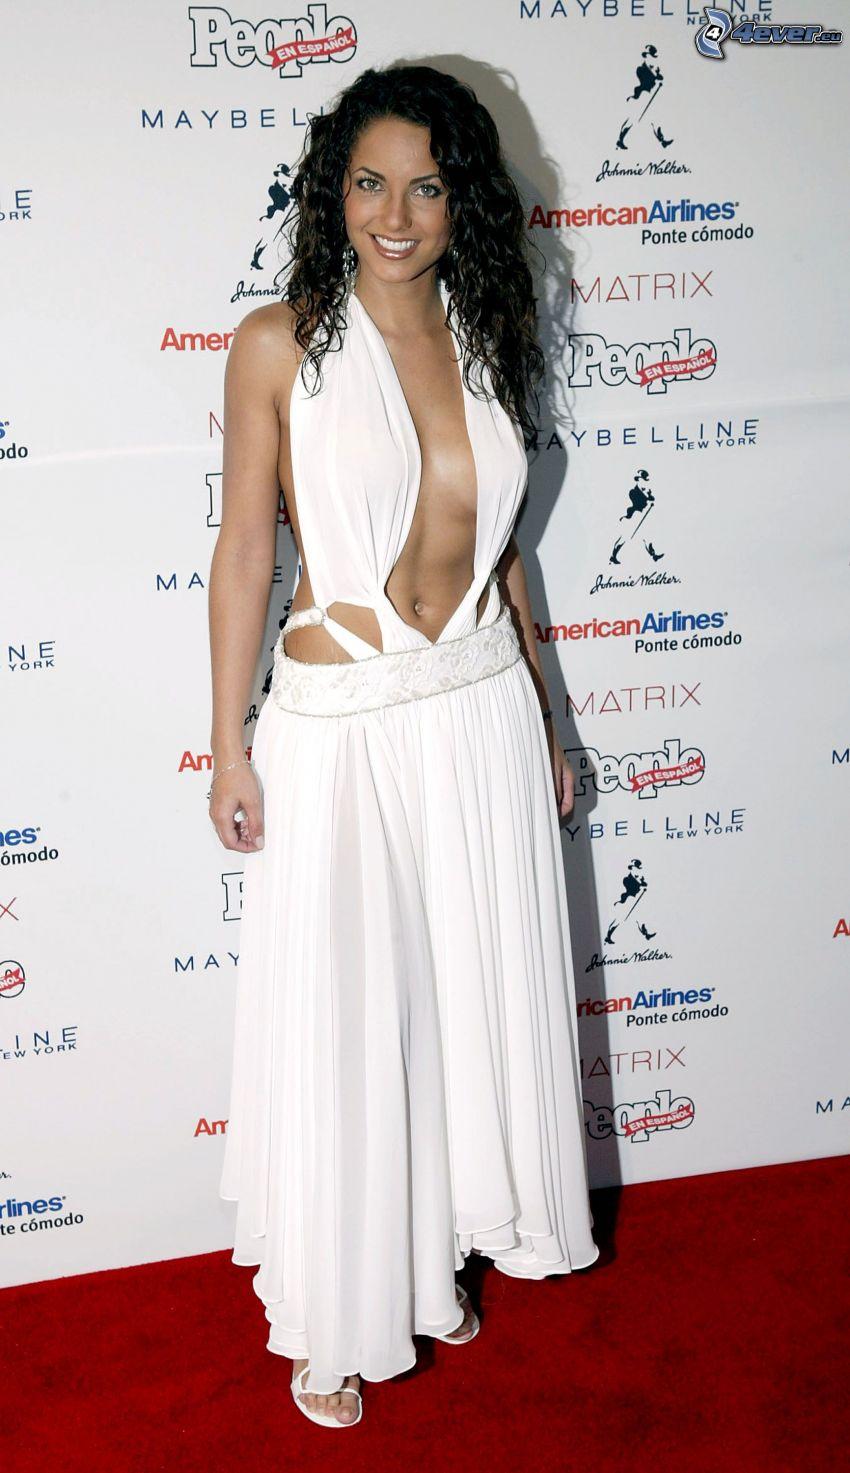 Barbara Mori, robe blanche, sans soutien-gorge